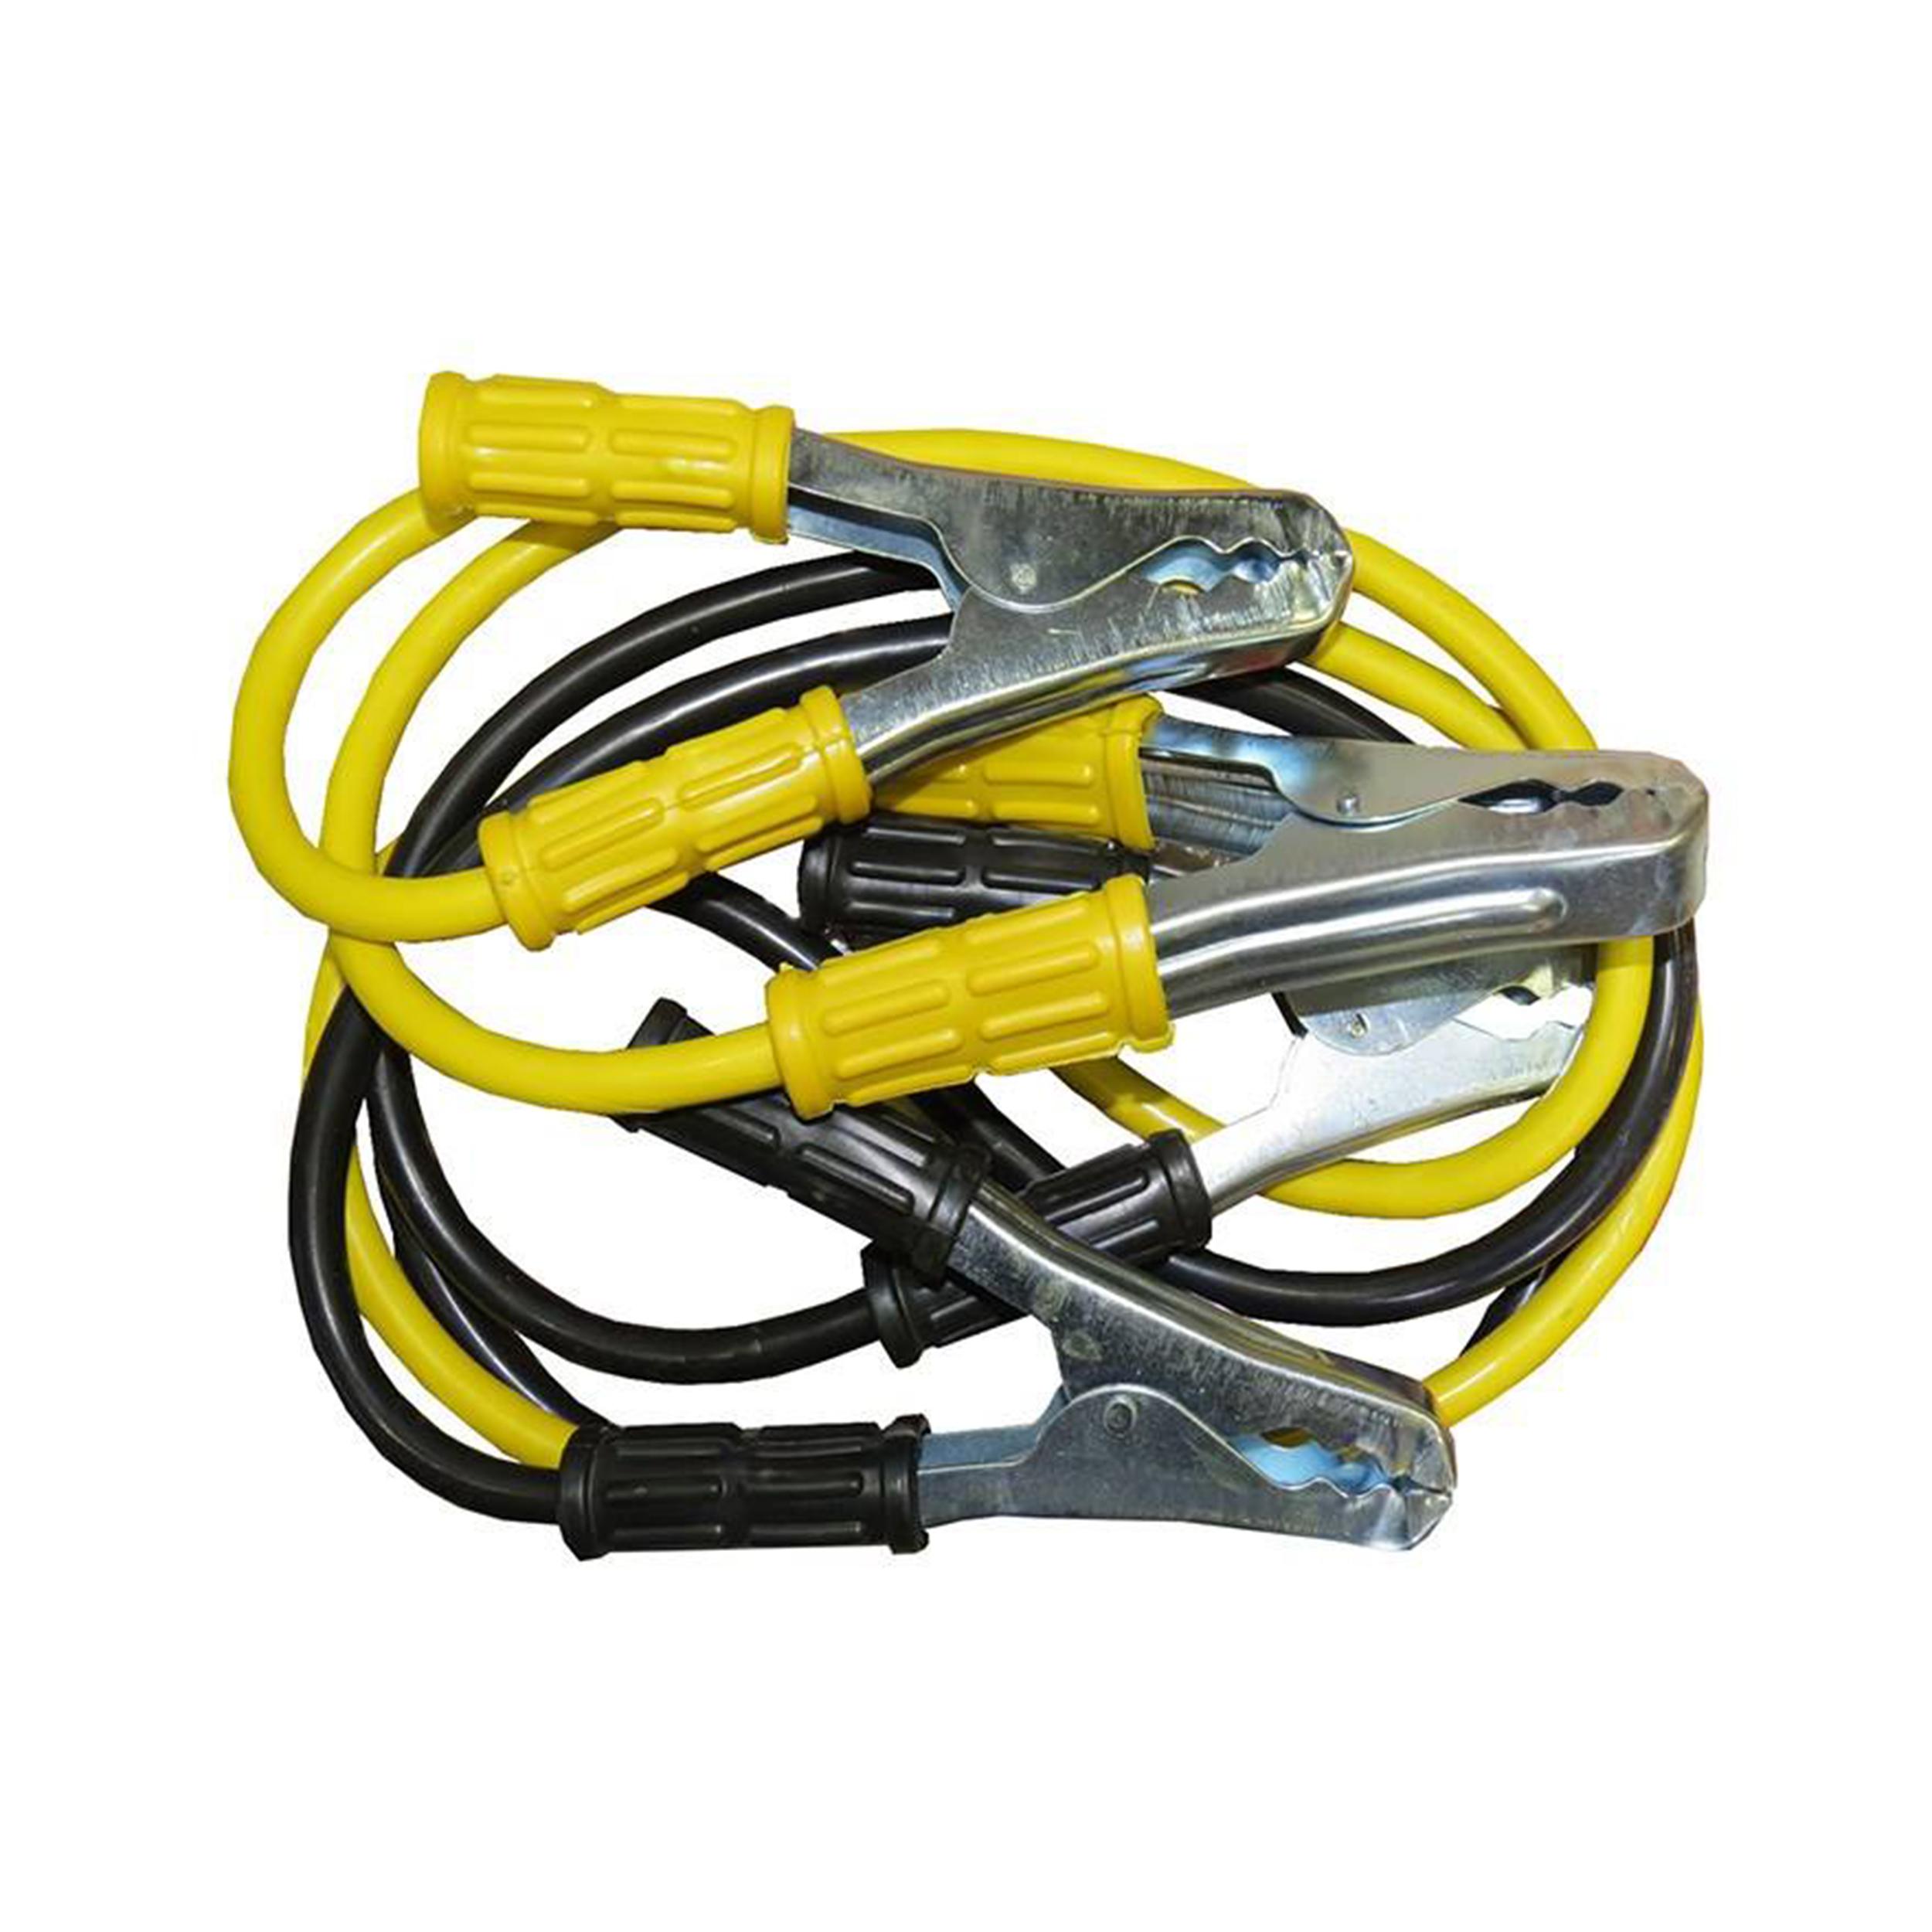 کابل اتصال باتری خودرو کد 021000